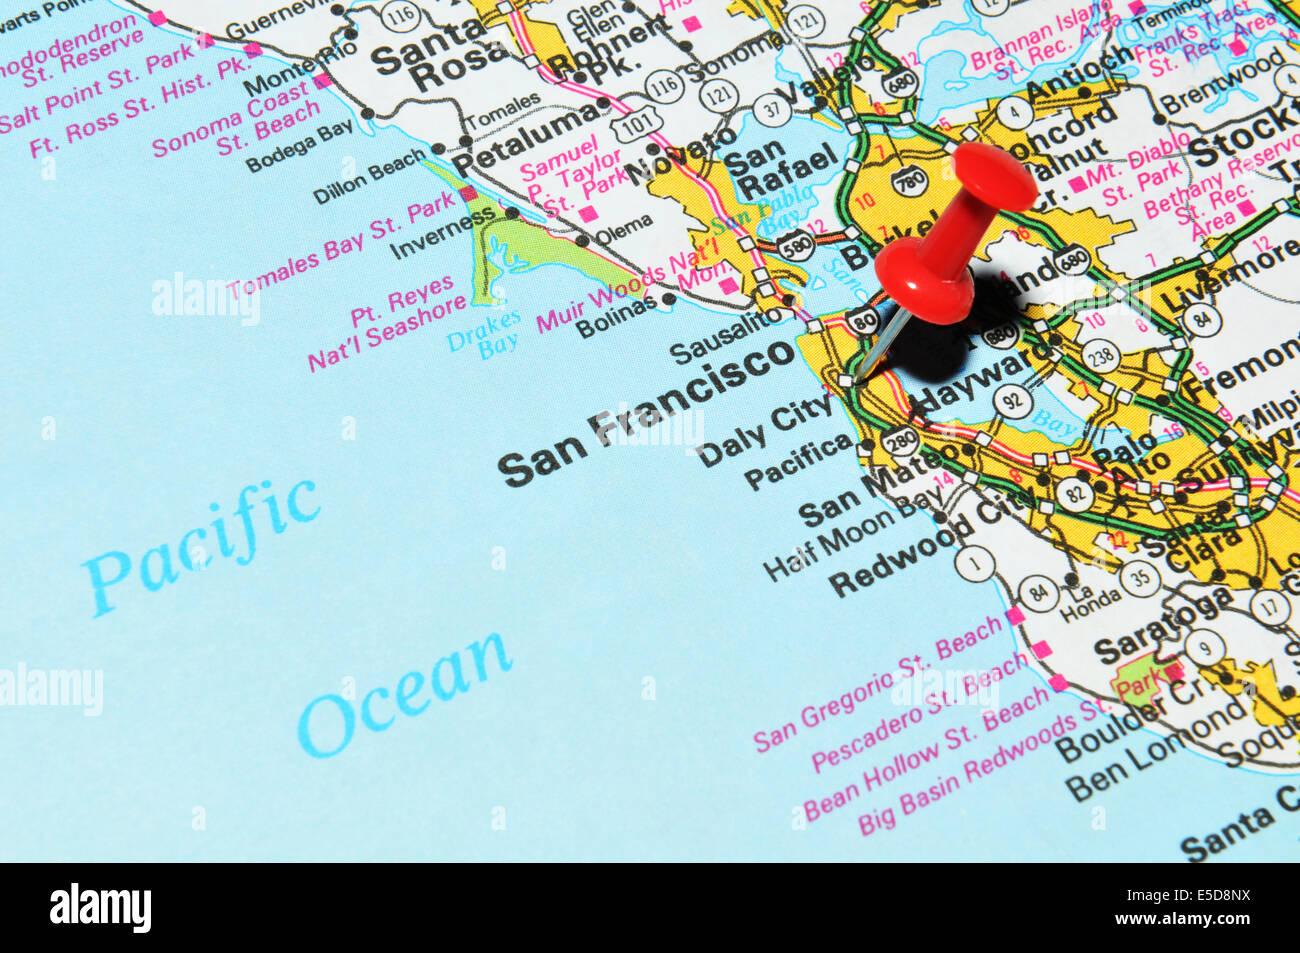 Diagram Collection Us Map San Francisco Download More Maps Usa Map San Francisco